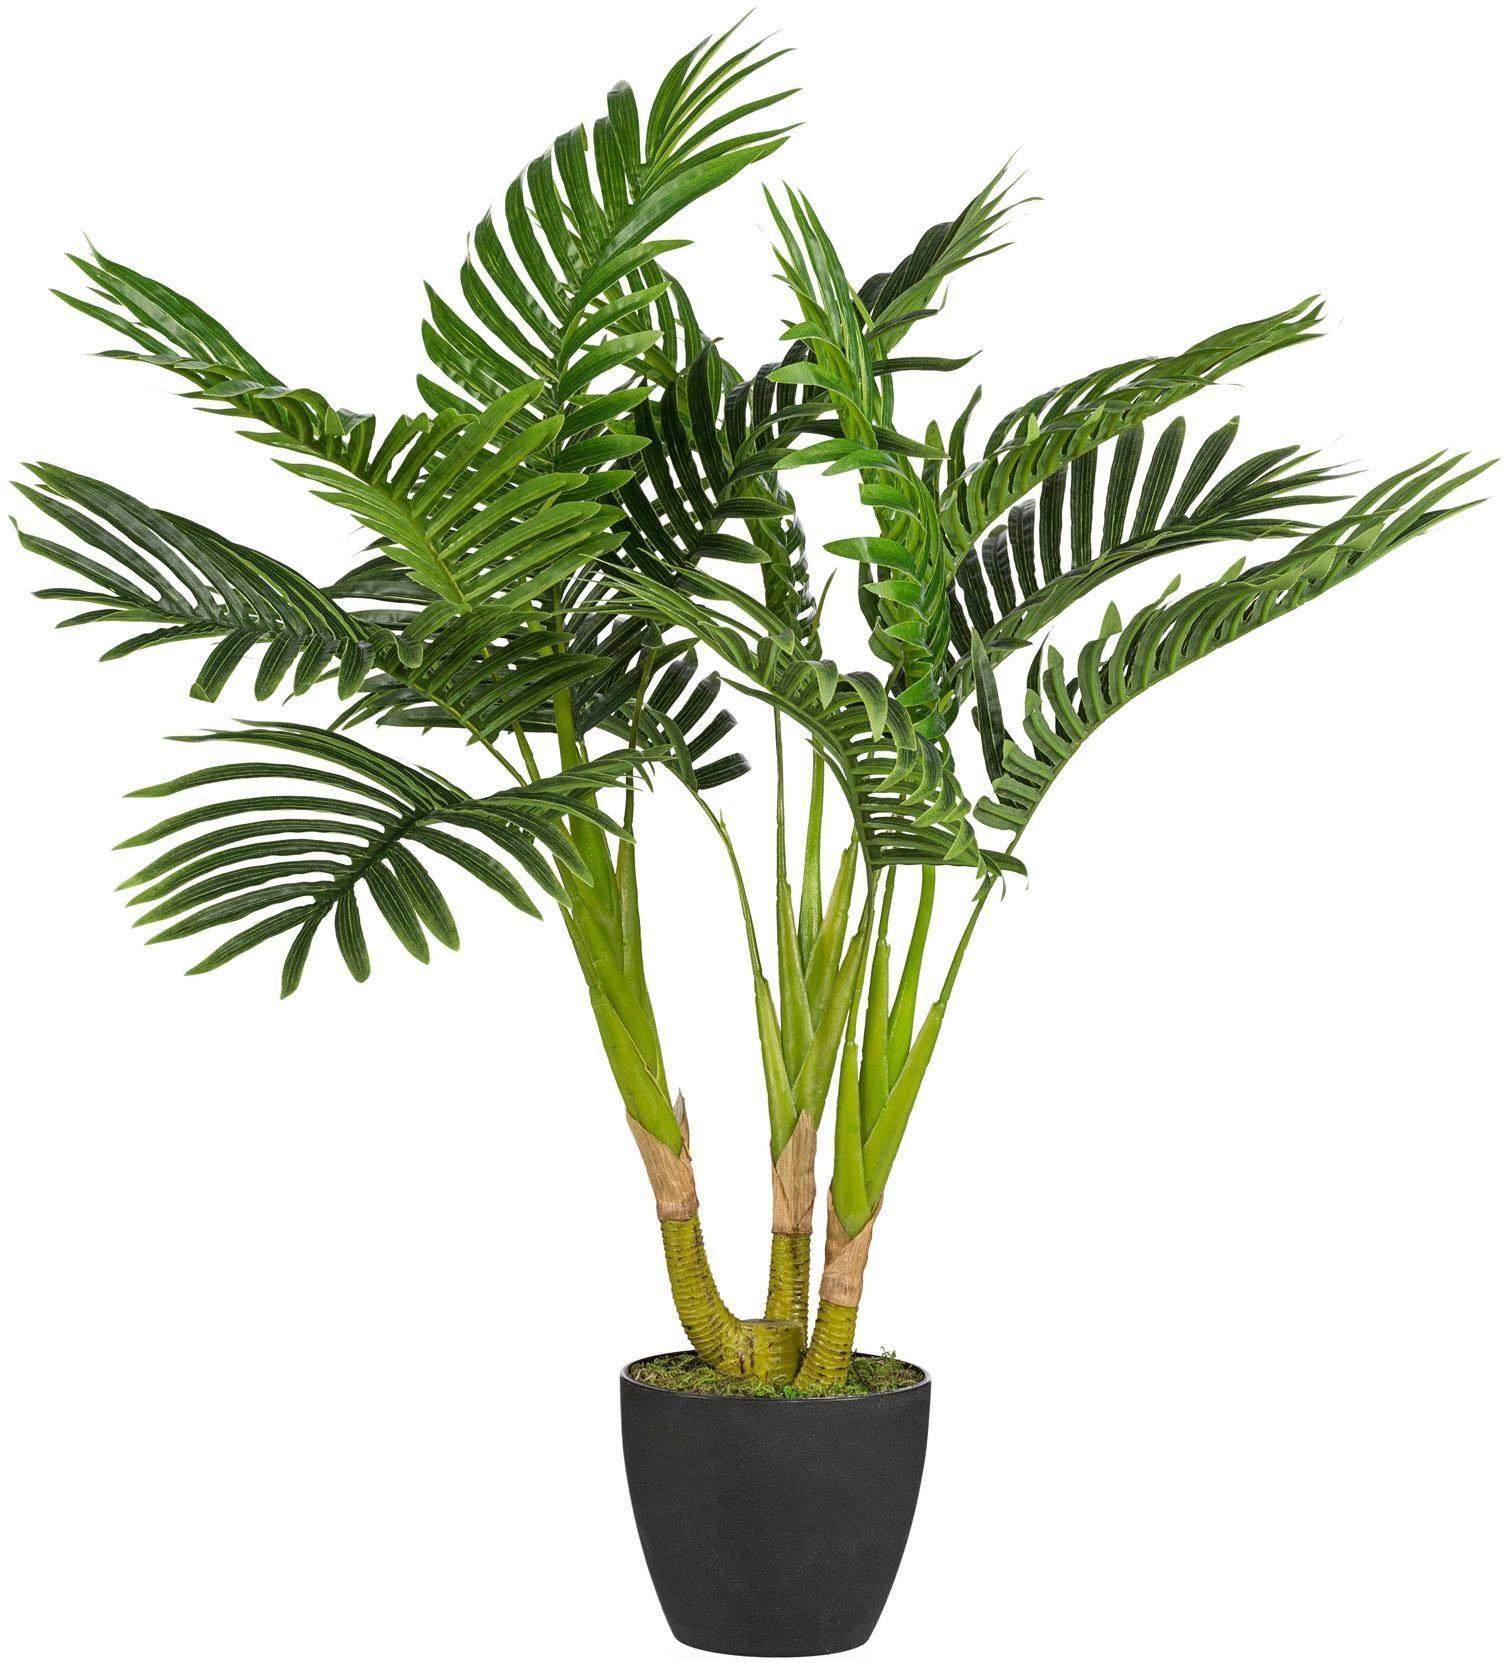 Home affaire Kunstpflanze »Kentiapalme«